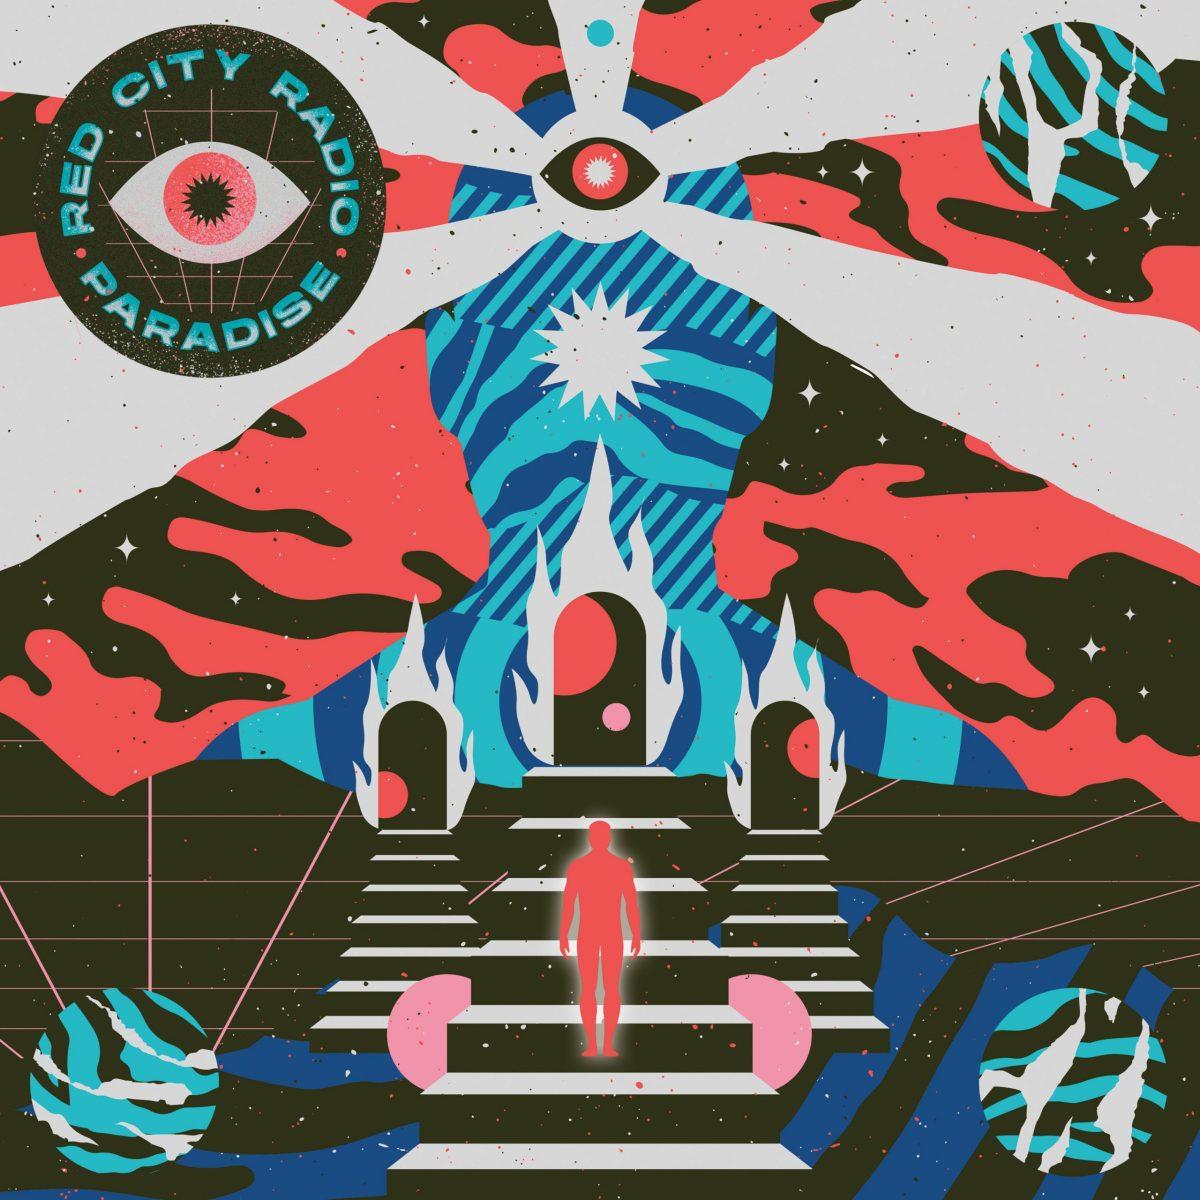 red-city-radio-paradise-album-review